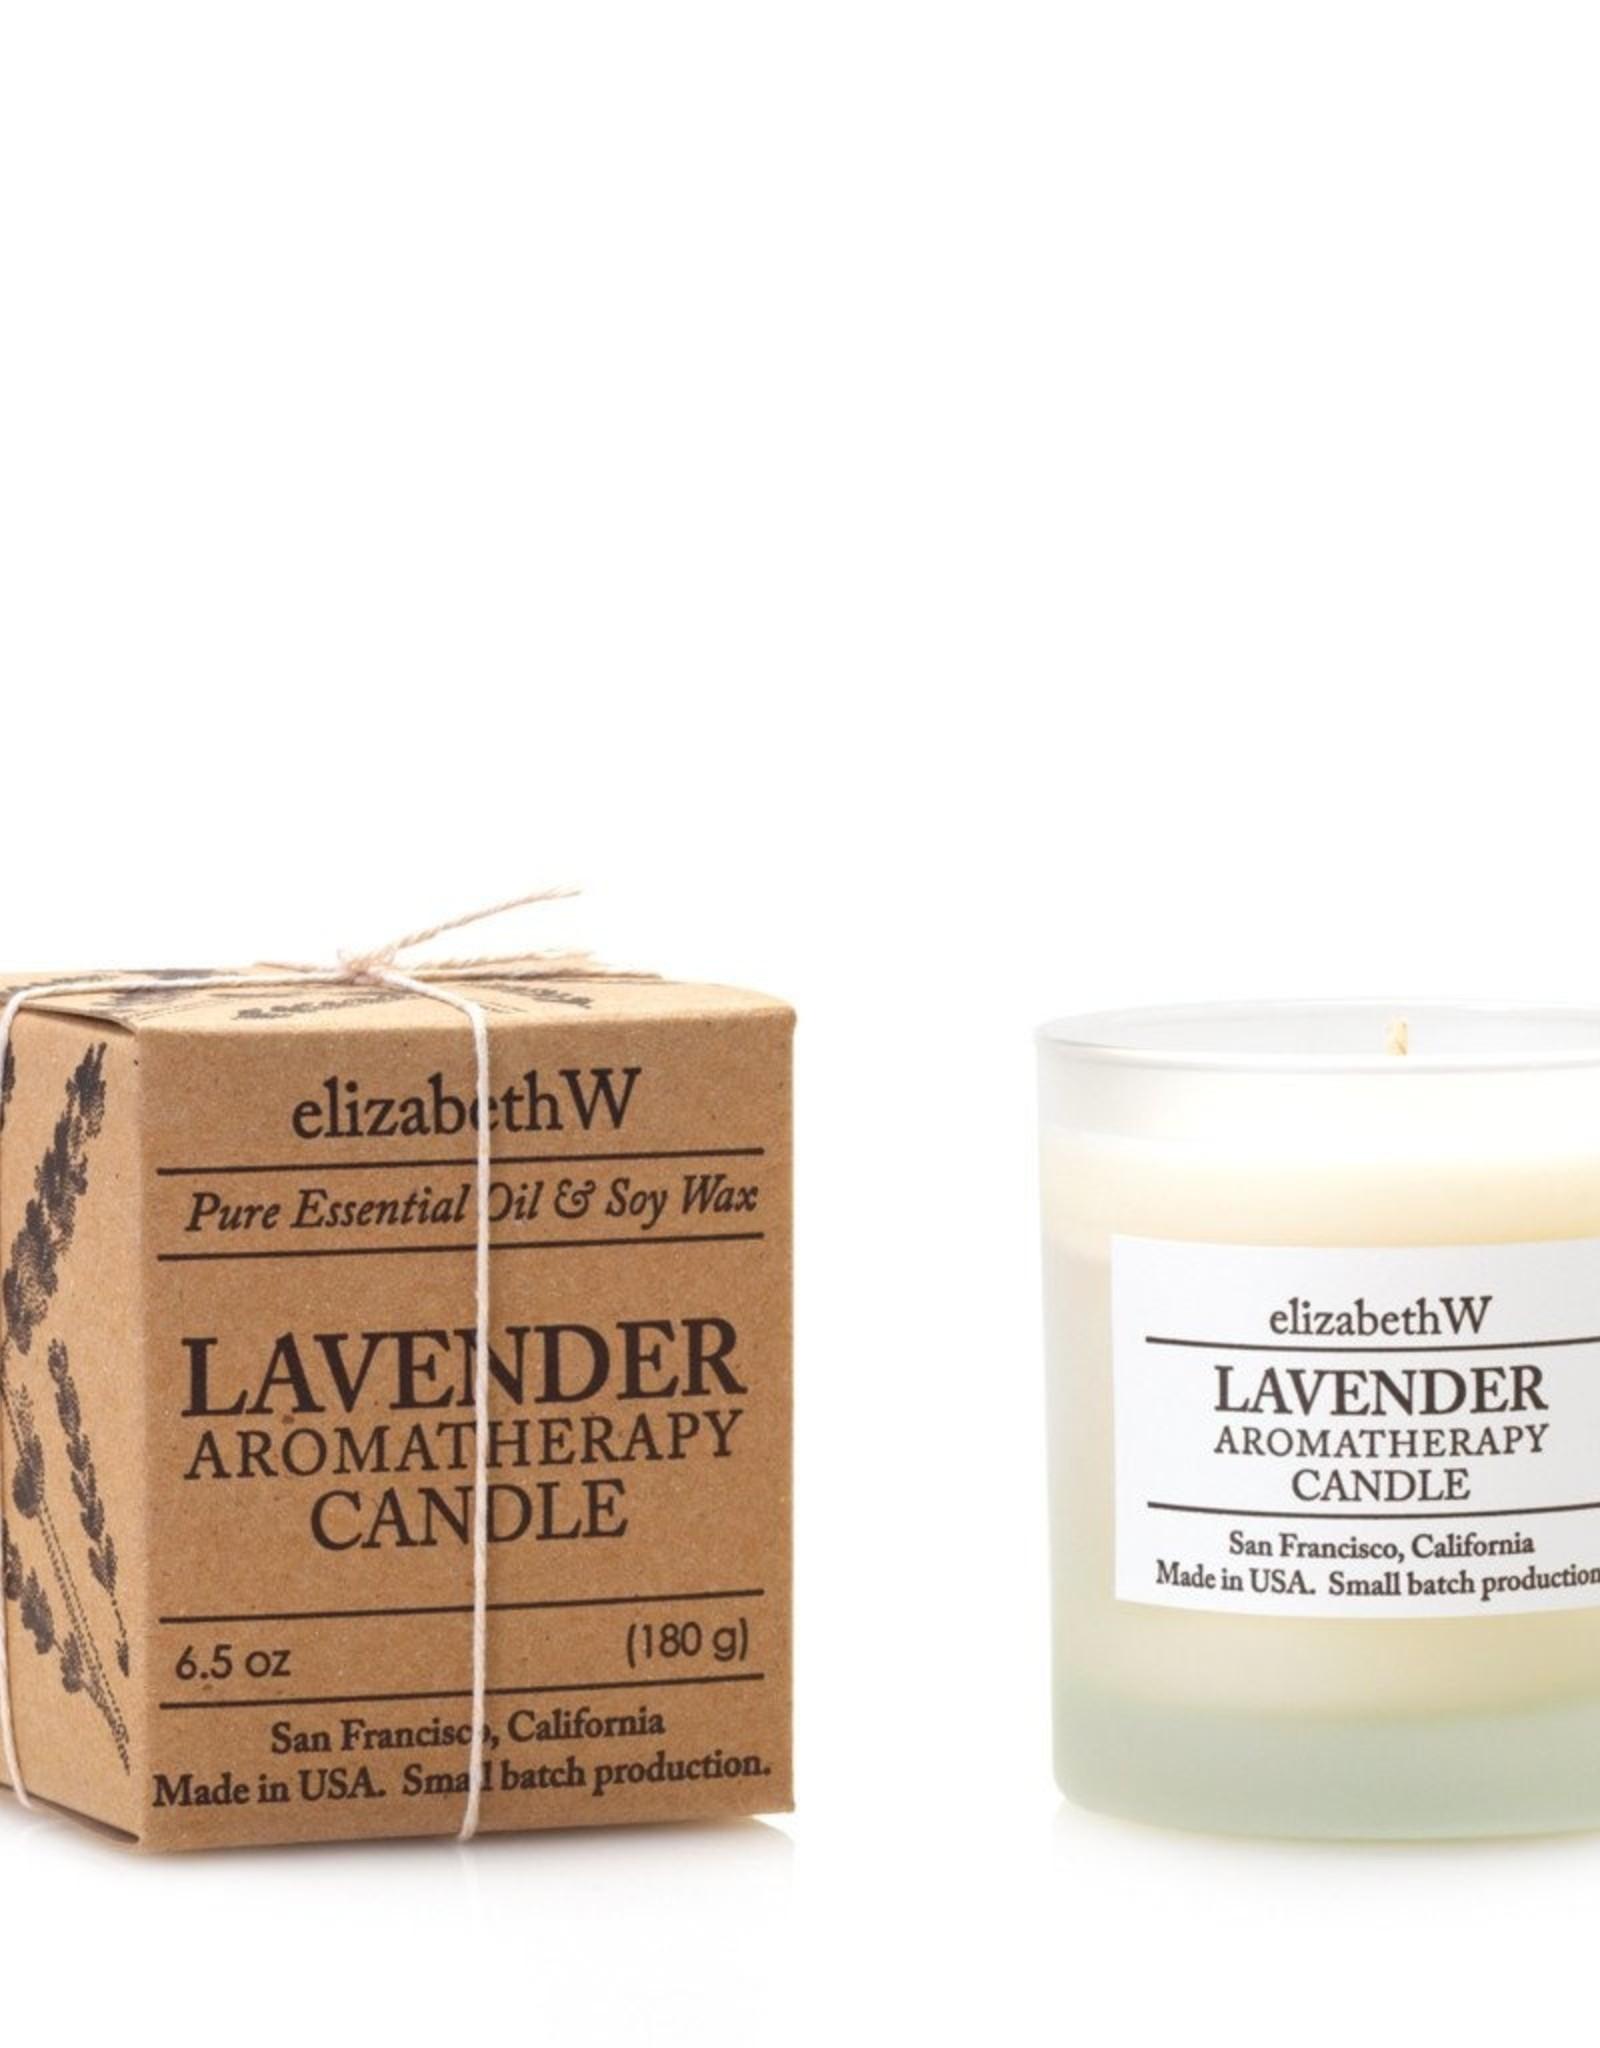 Elizabeth W Lavender Aromatherapy Candle